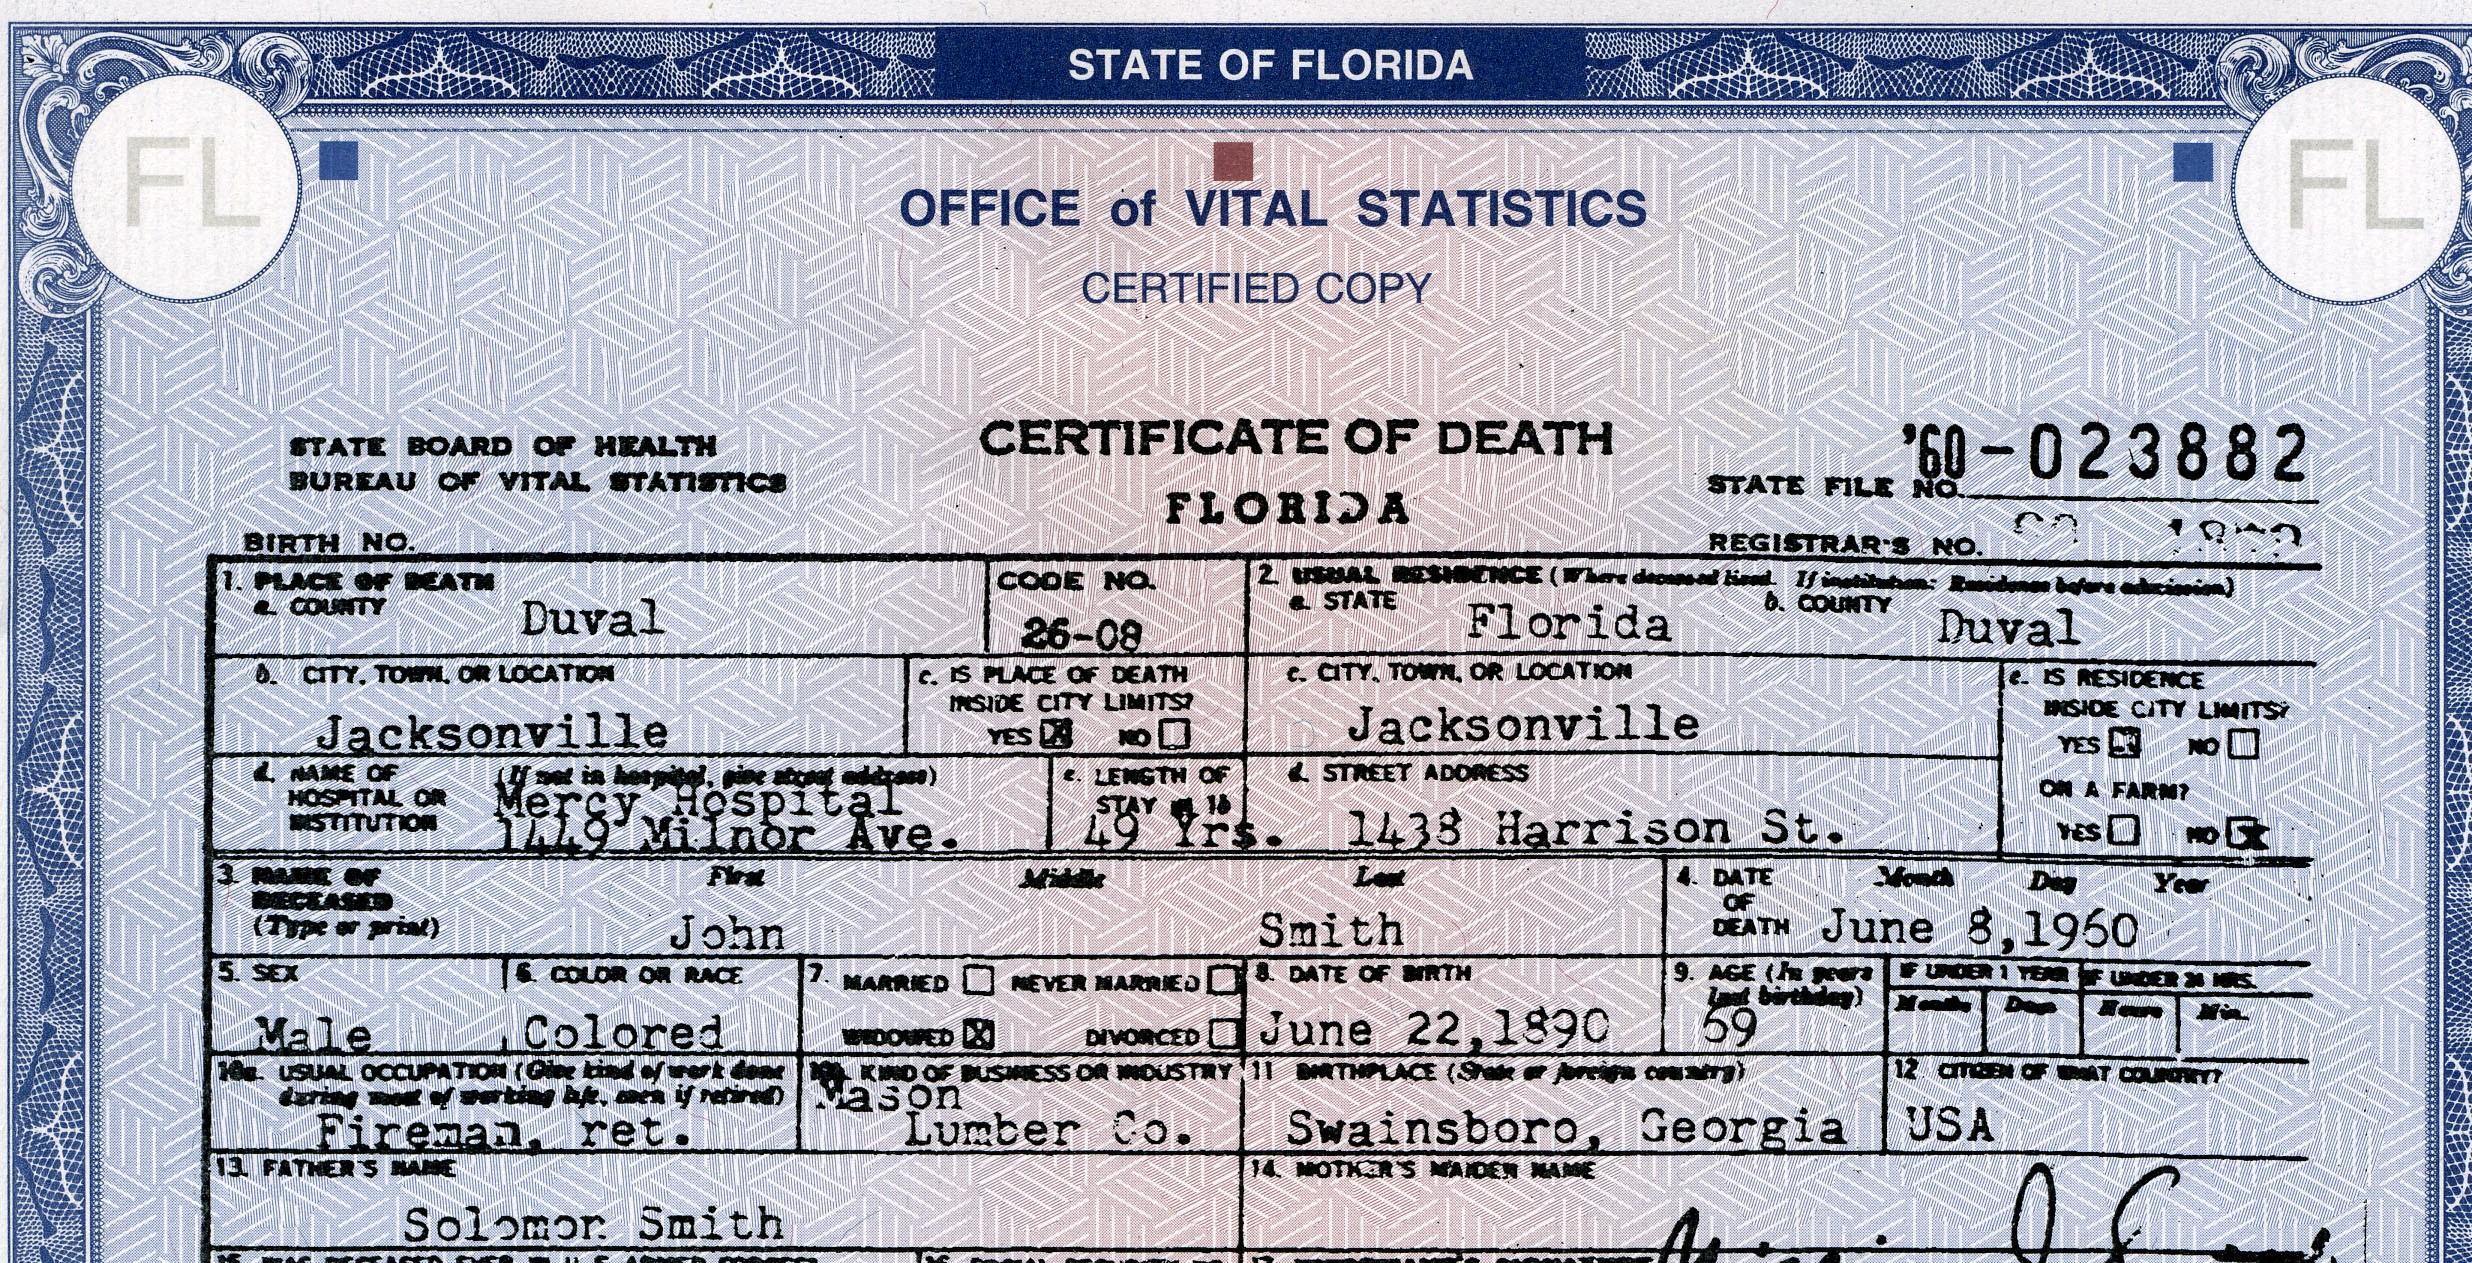 BIRTH AND DEATH RECORDS